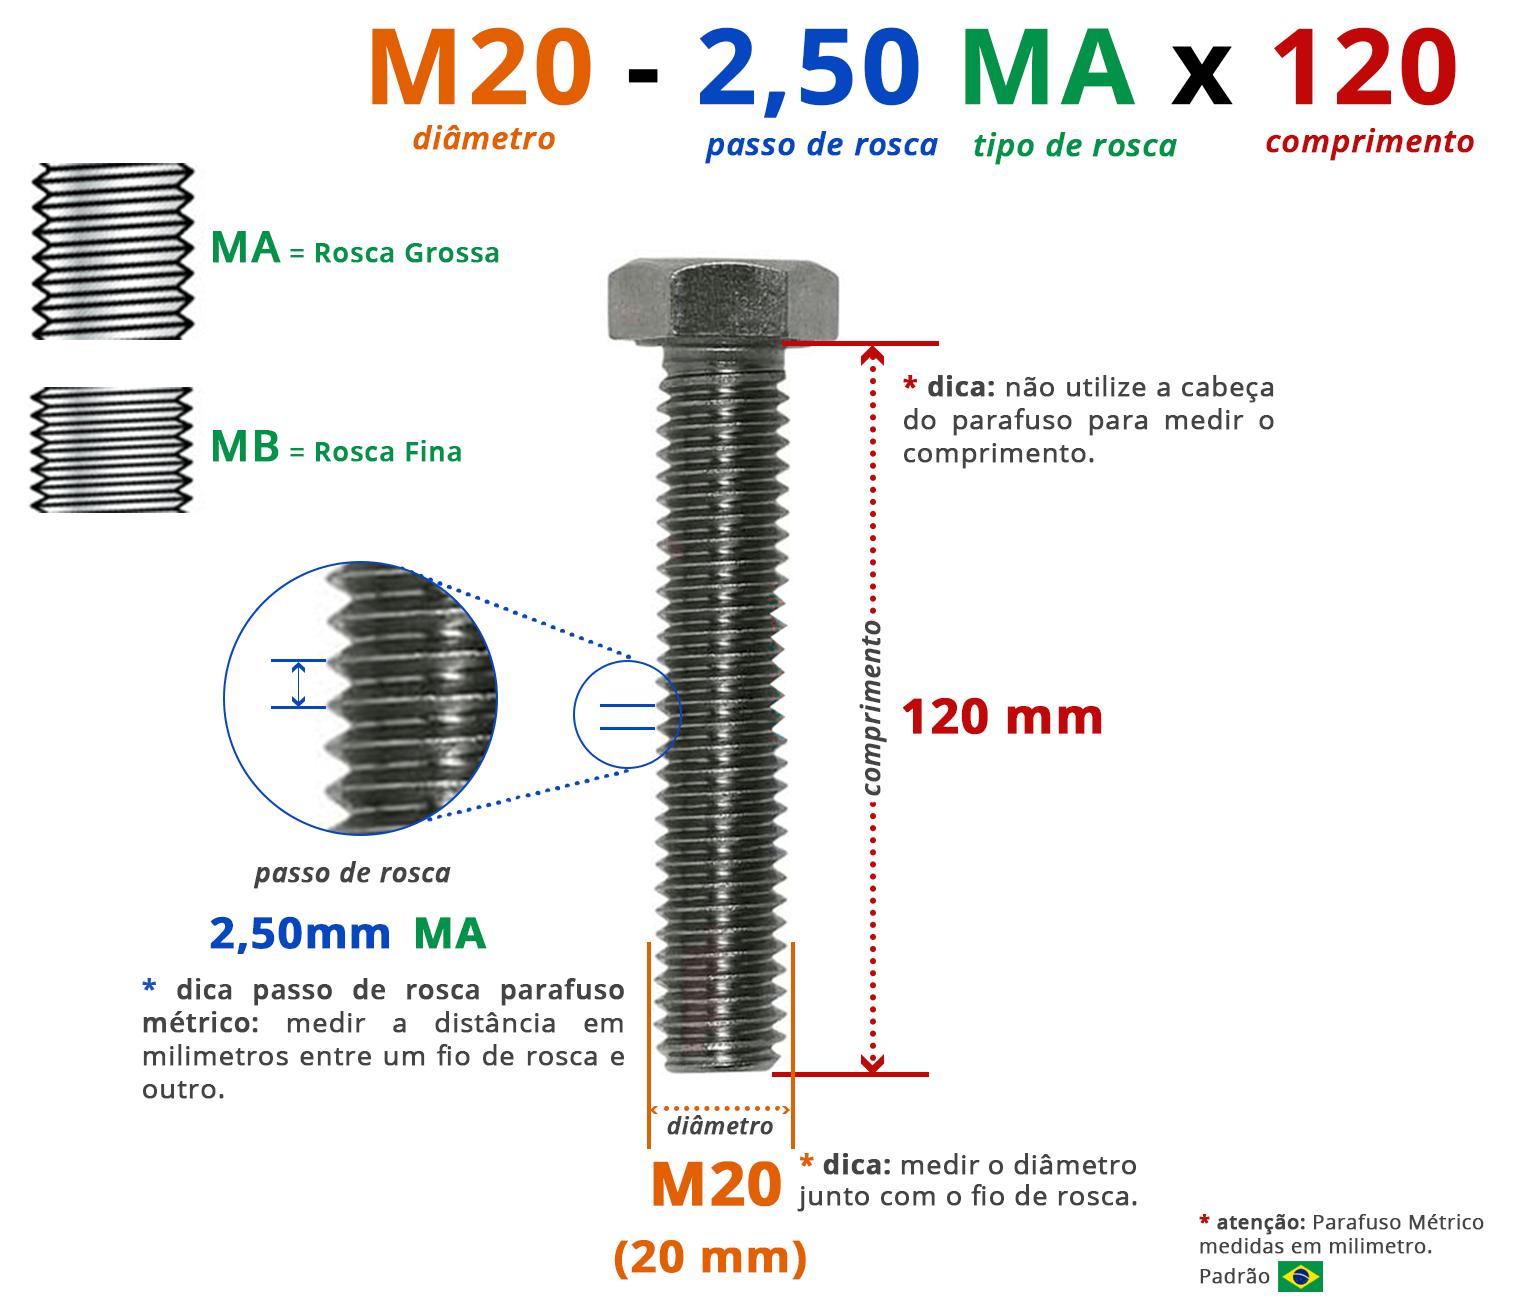 PARAFUSO SEXTAVADO ROSCA INTEIRA M20 2,50 MA X 120 DIN 933 INOX A4